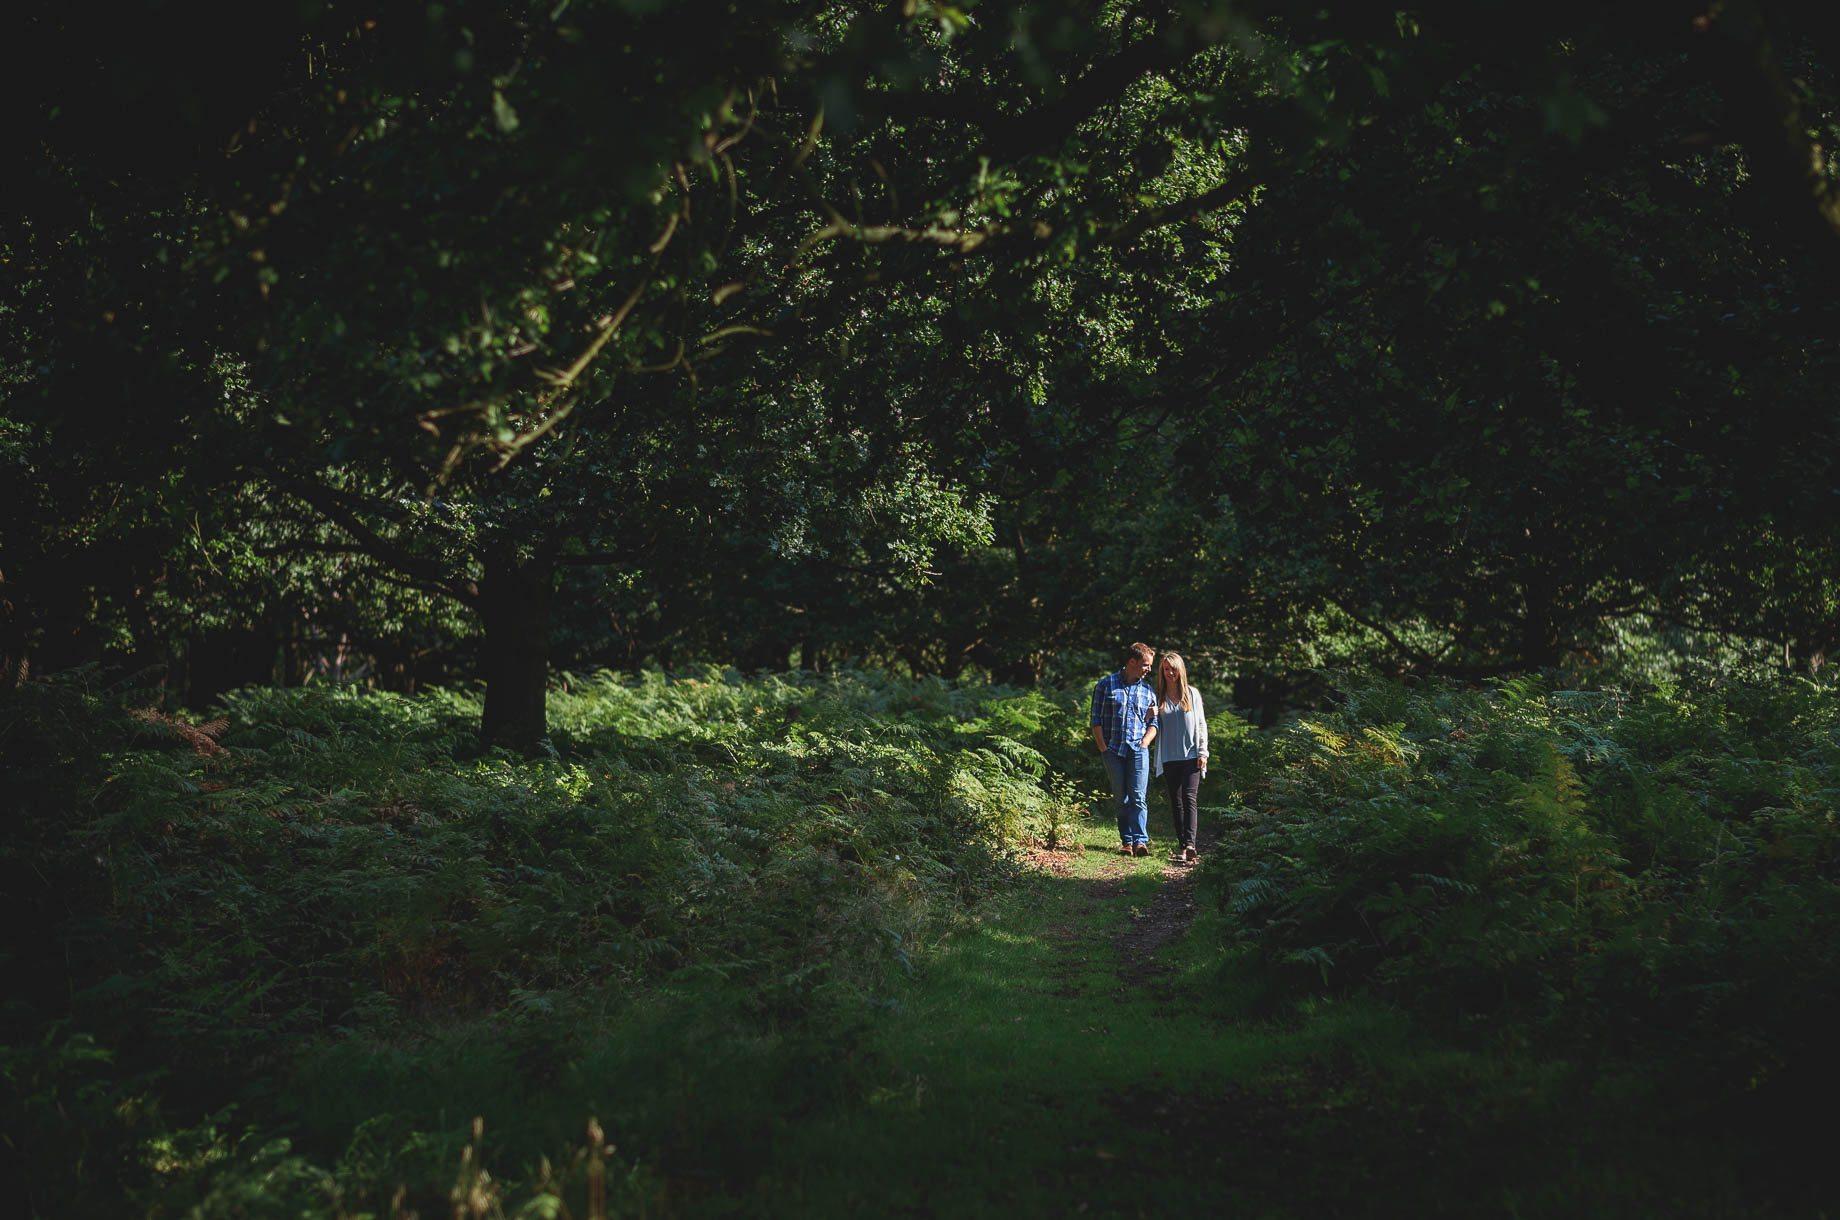 Richmond-Park-wedding-photography-Lauren-and-Nick-11-of-29